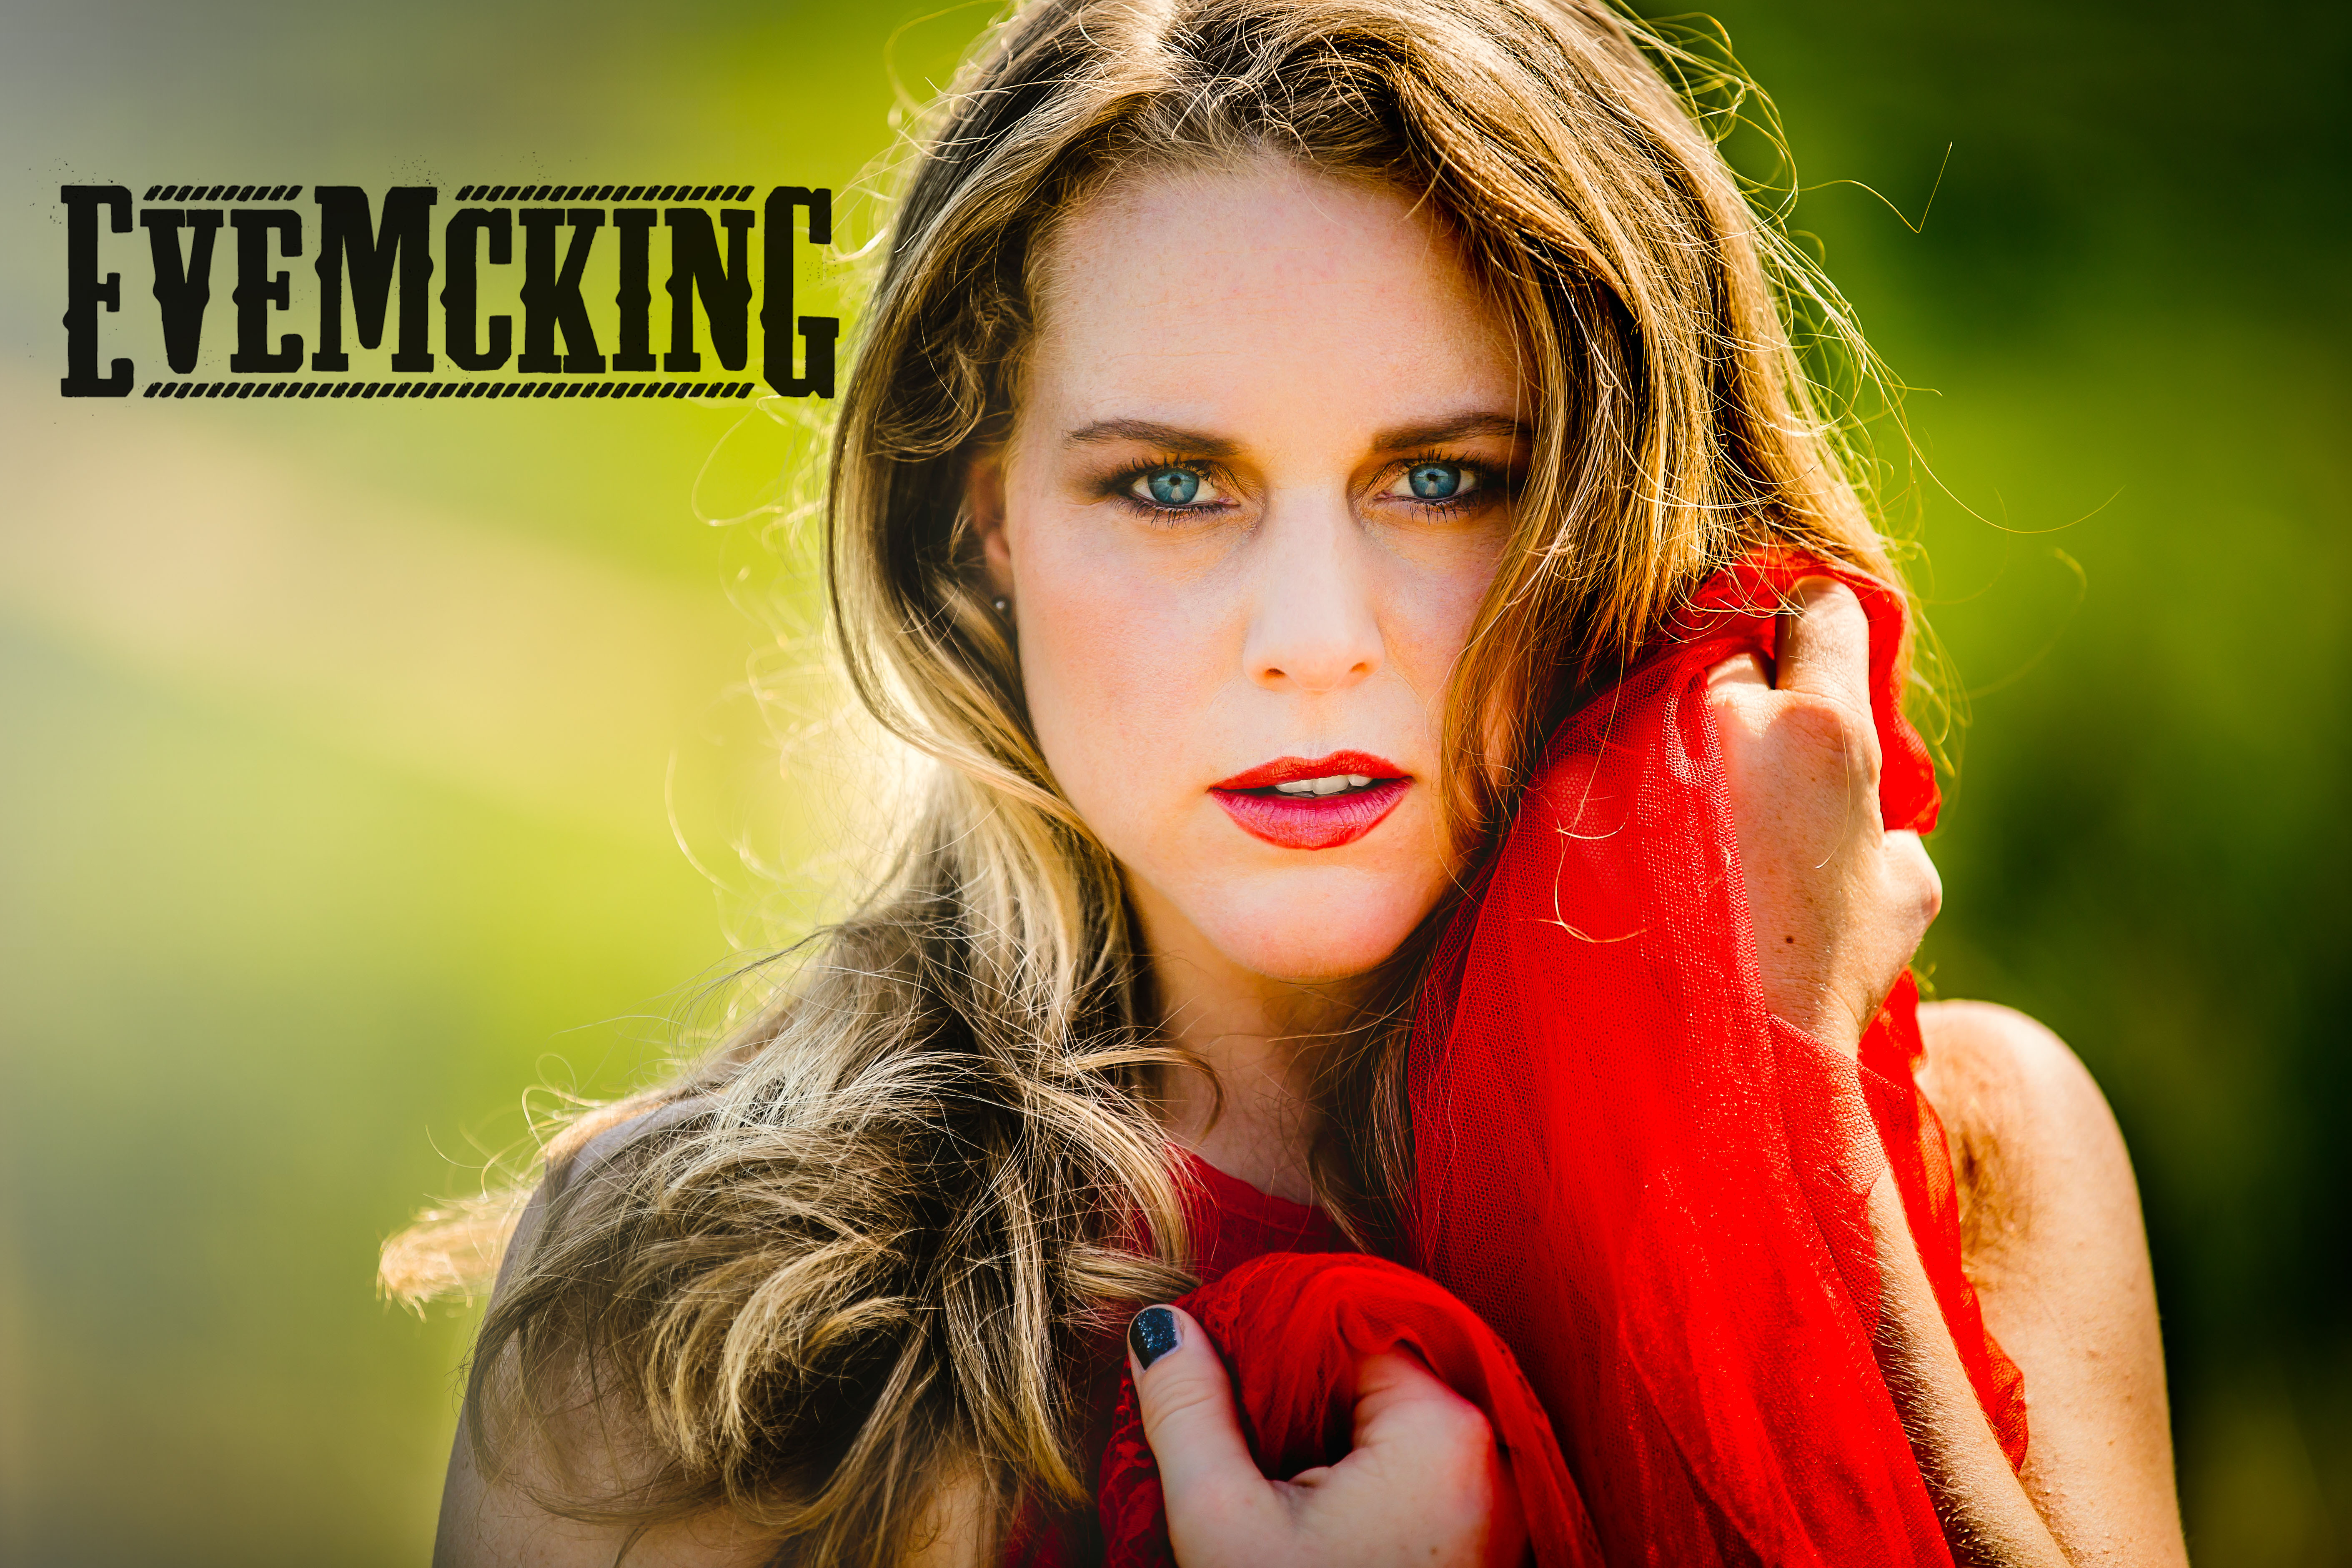 Eve McKing